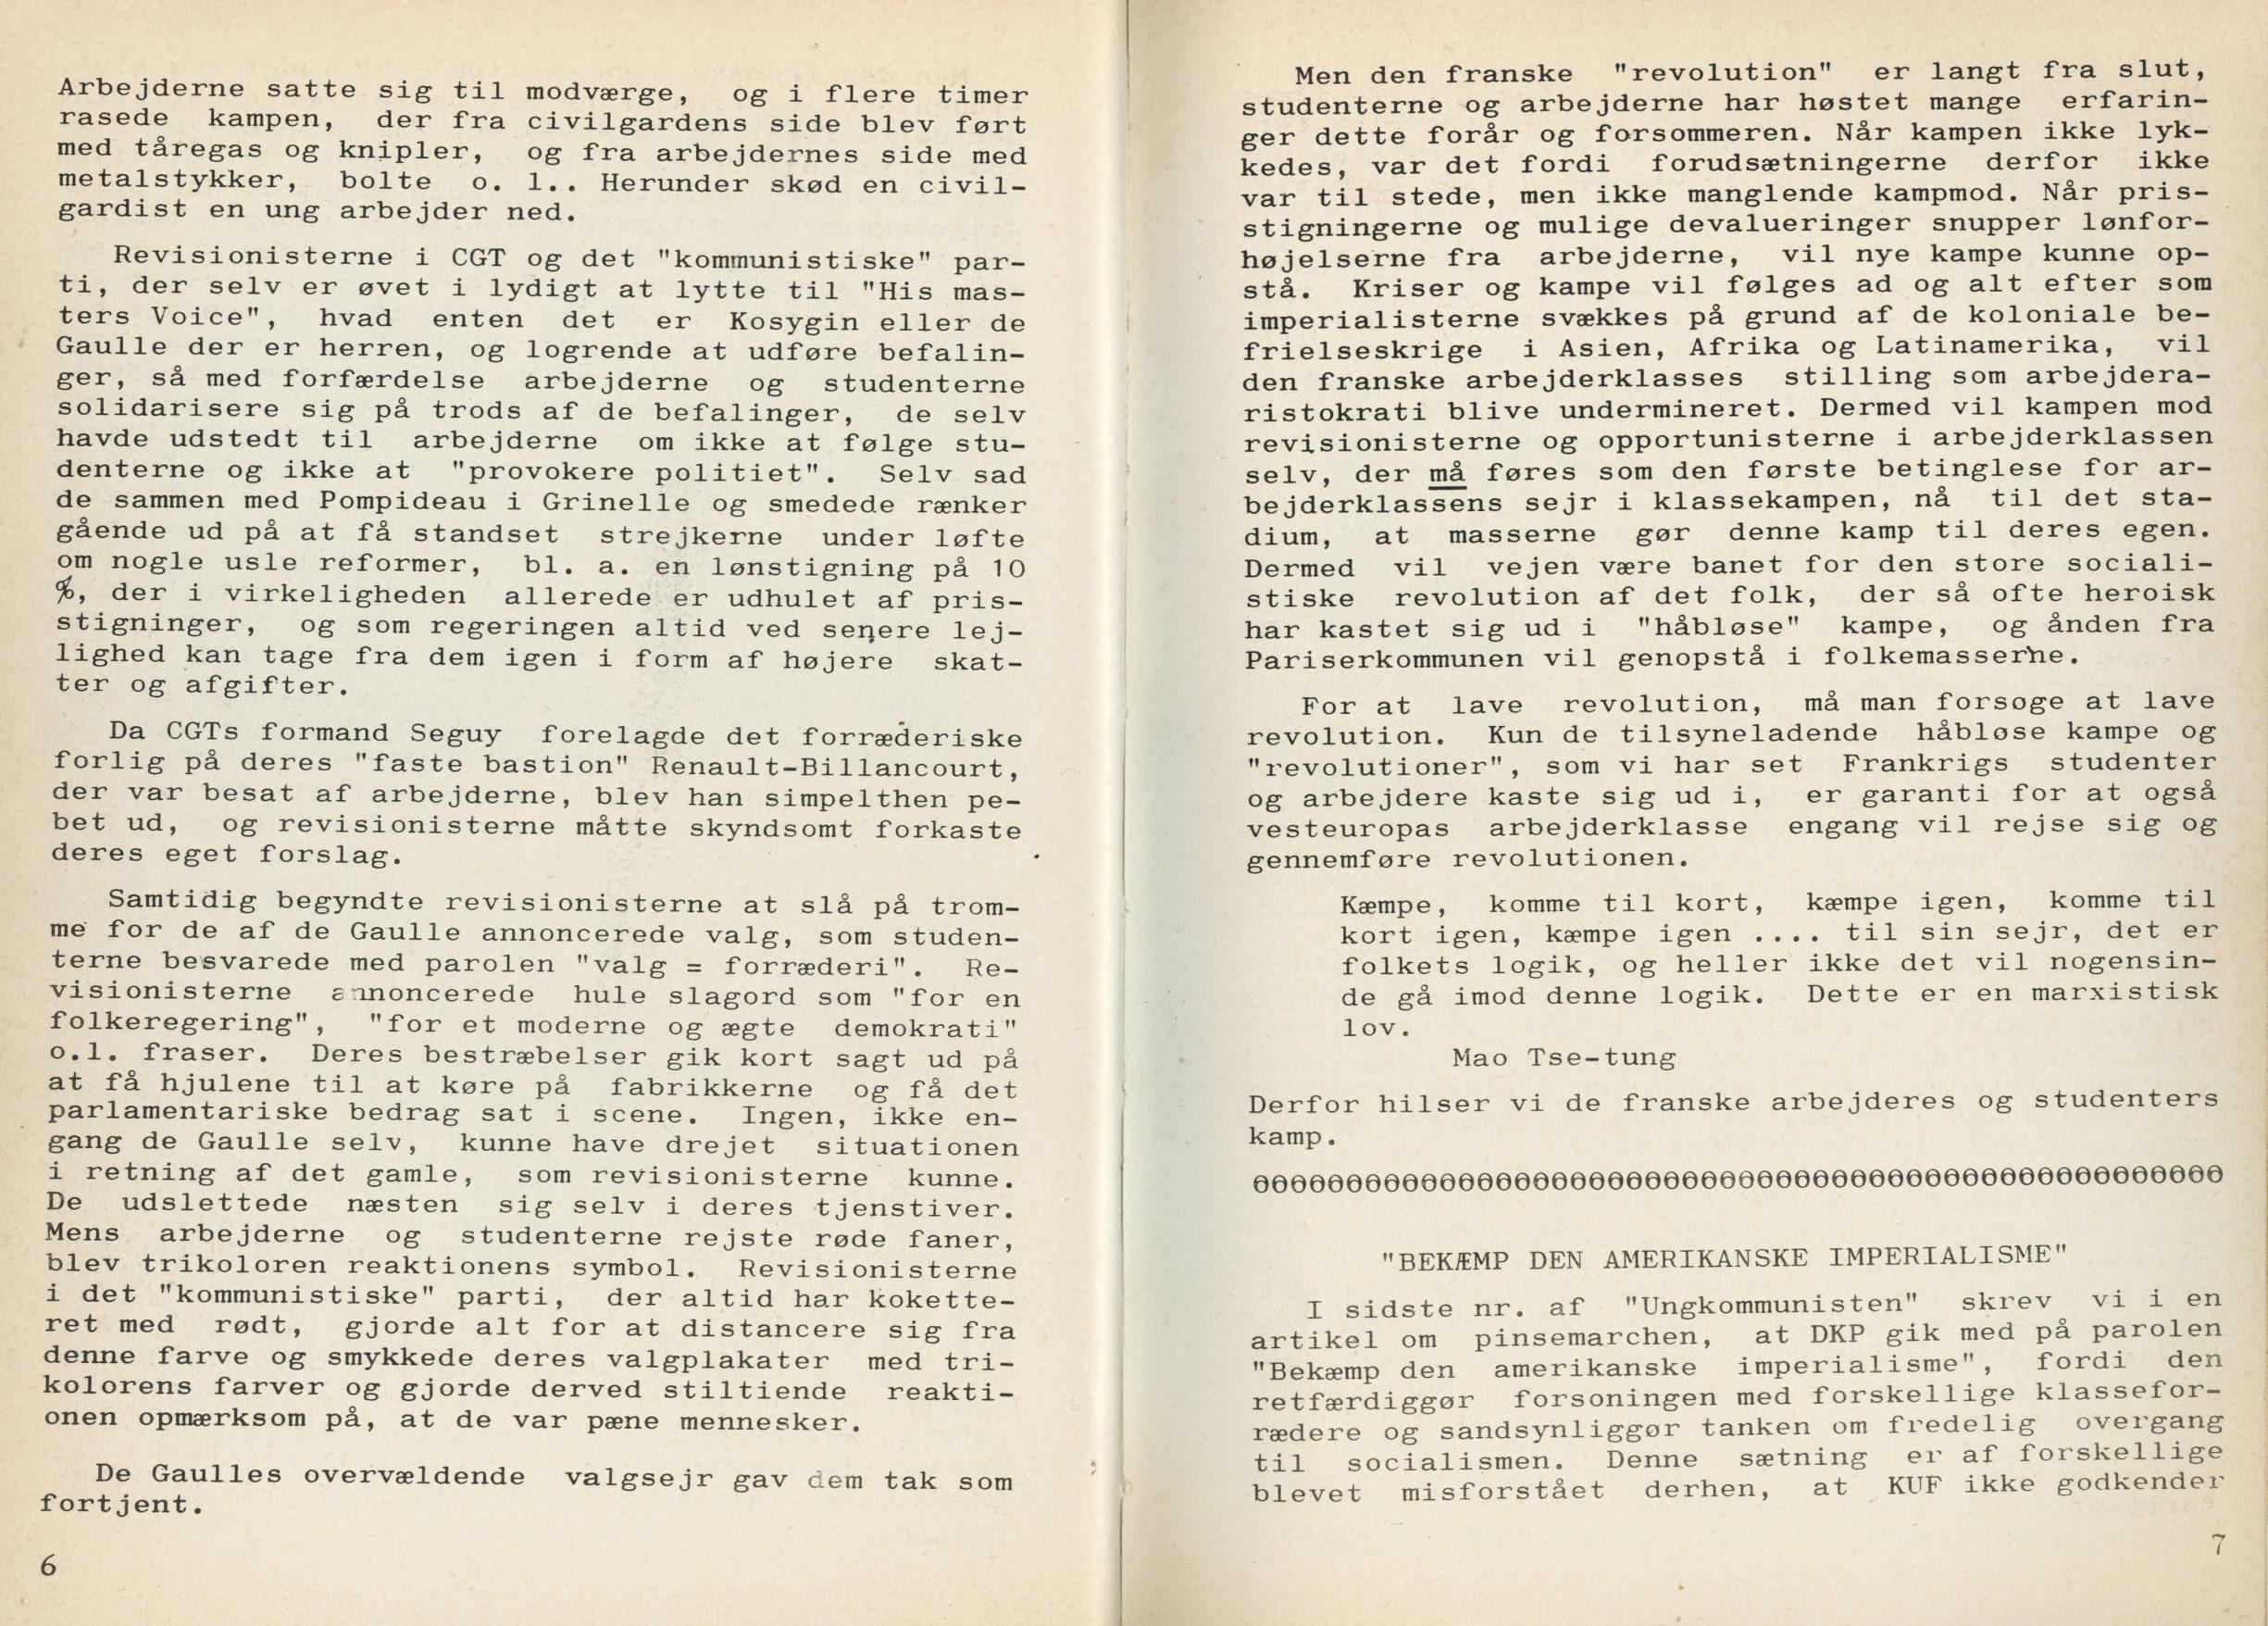 Ungkommunisten1968 nr. 8 s. 6-7.